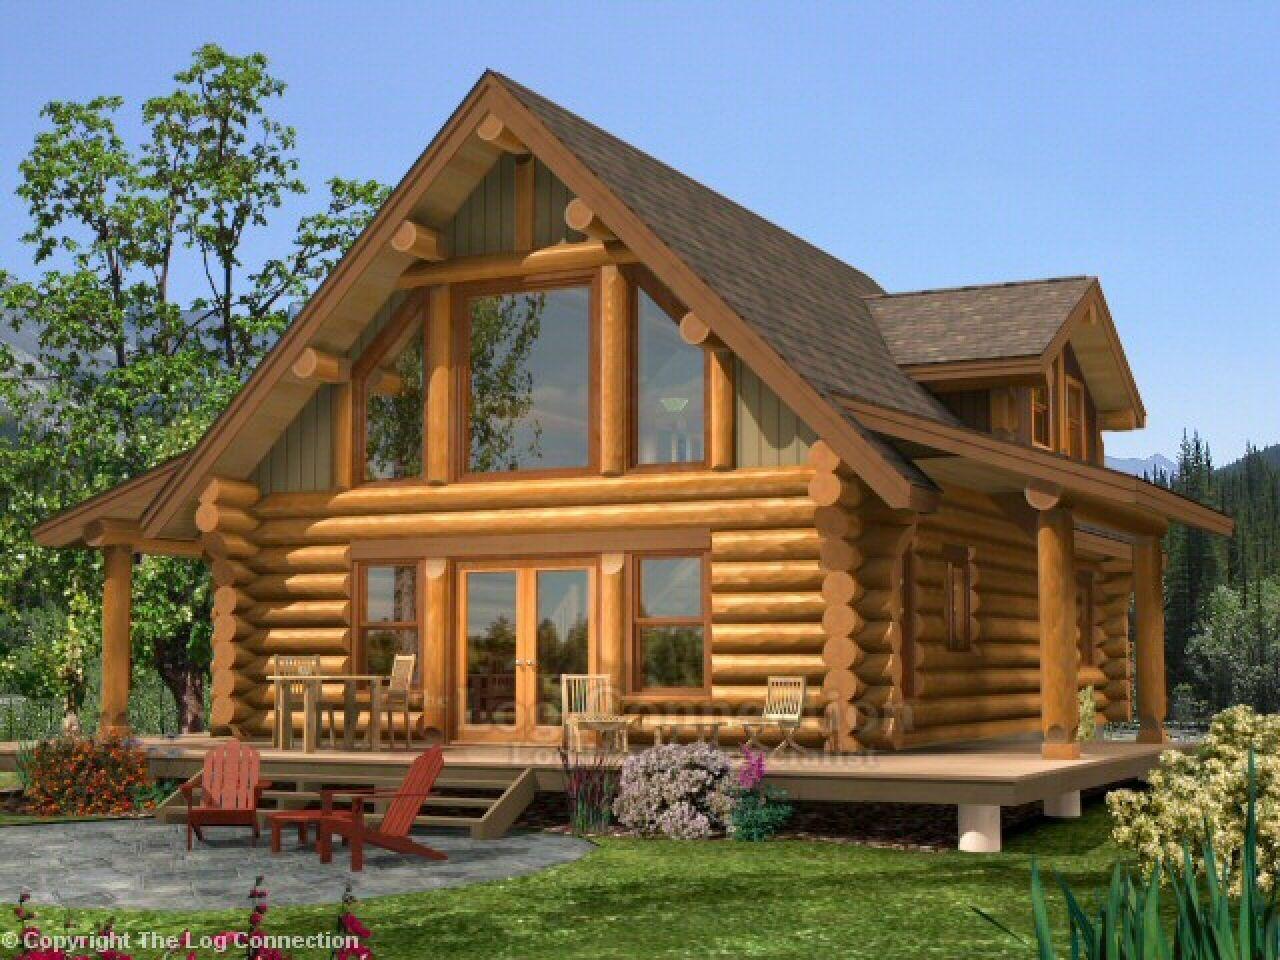 House Kits To Build With Prices Casas De Troncos Modelos De Casas Prefabricadas Casas De Madera